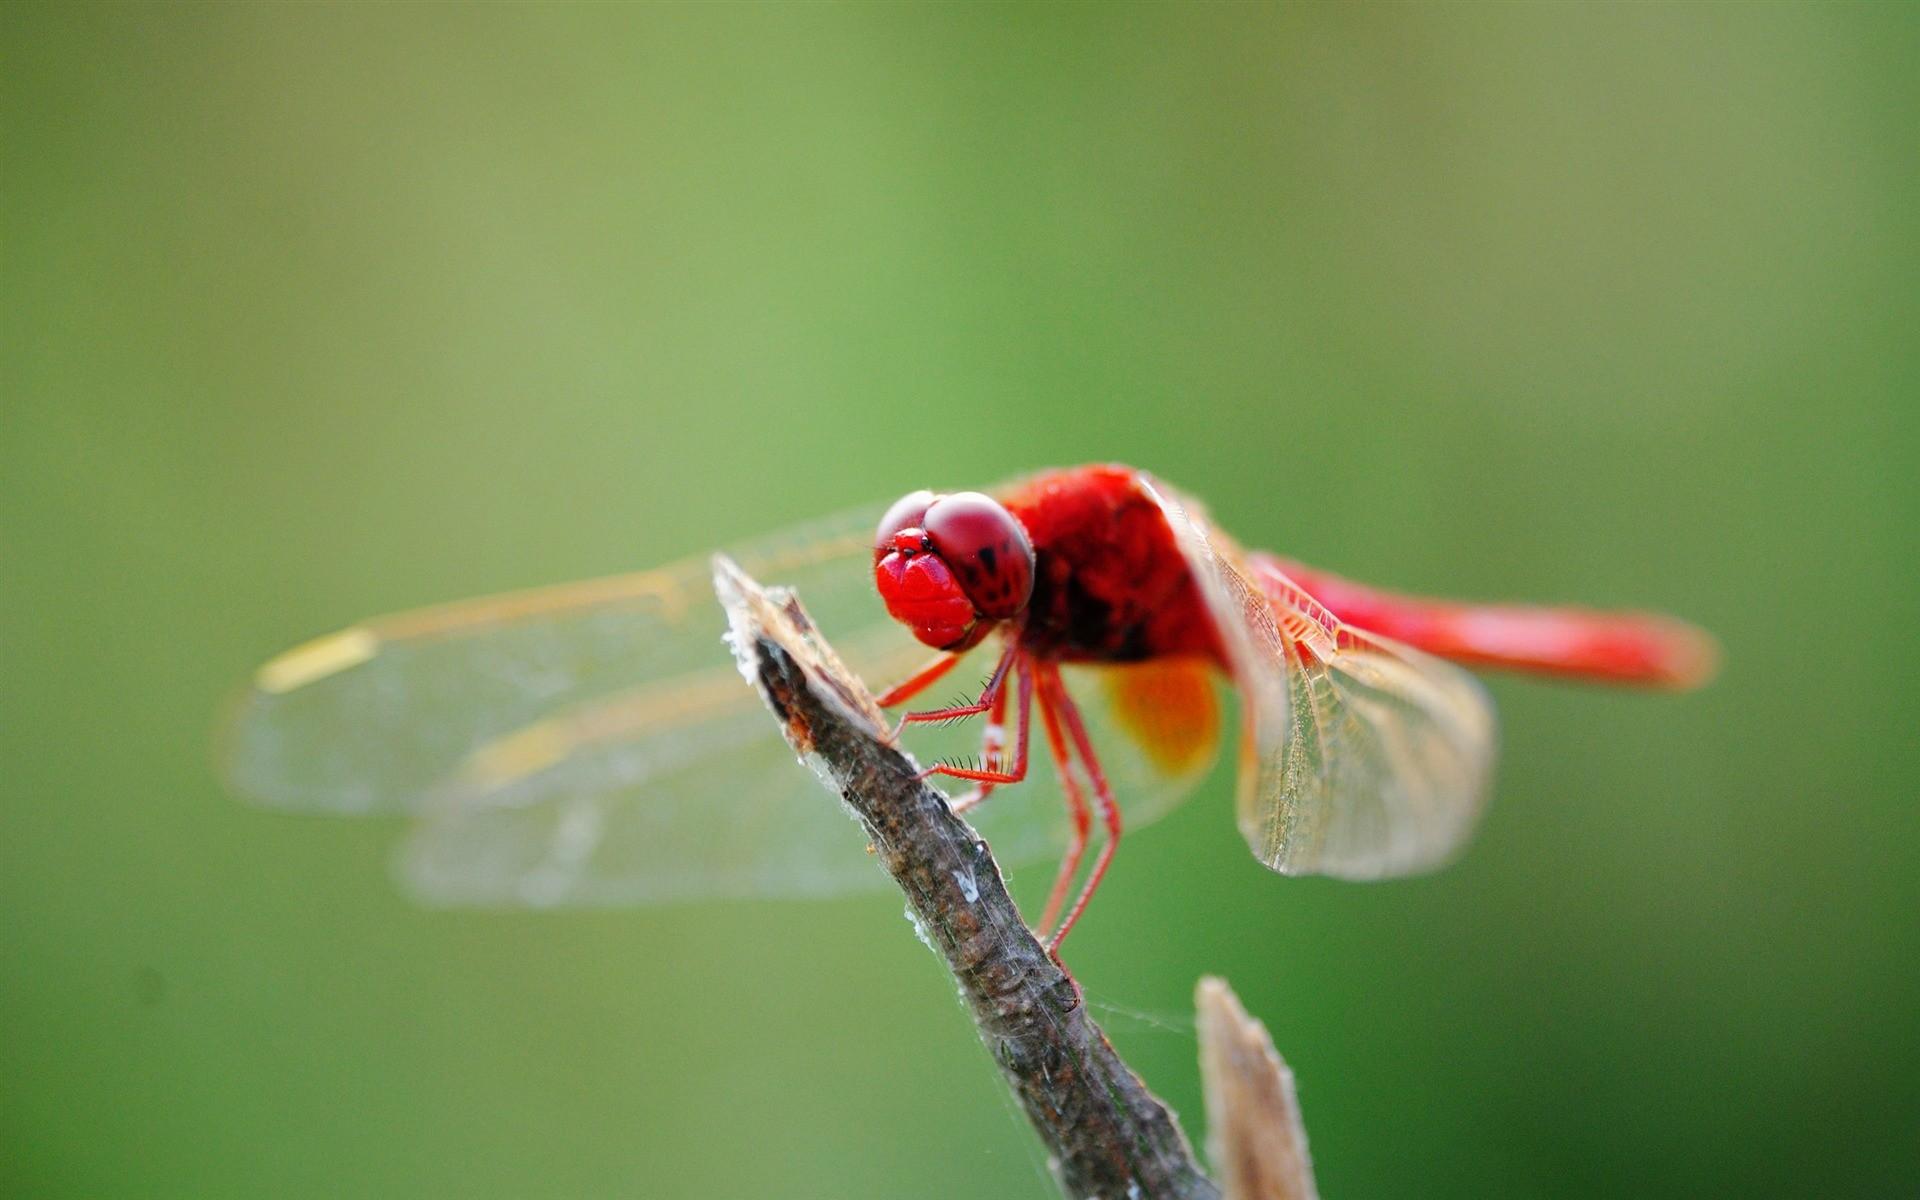 Una hermosa libelula - 1920x1200